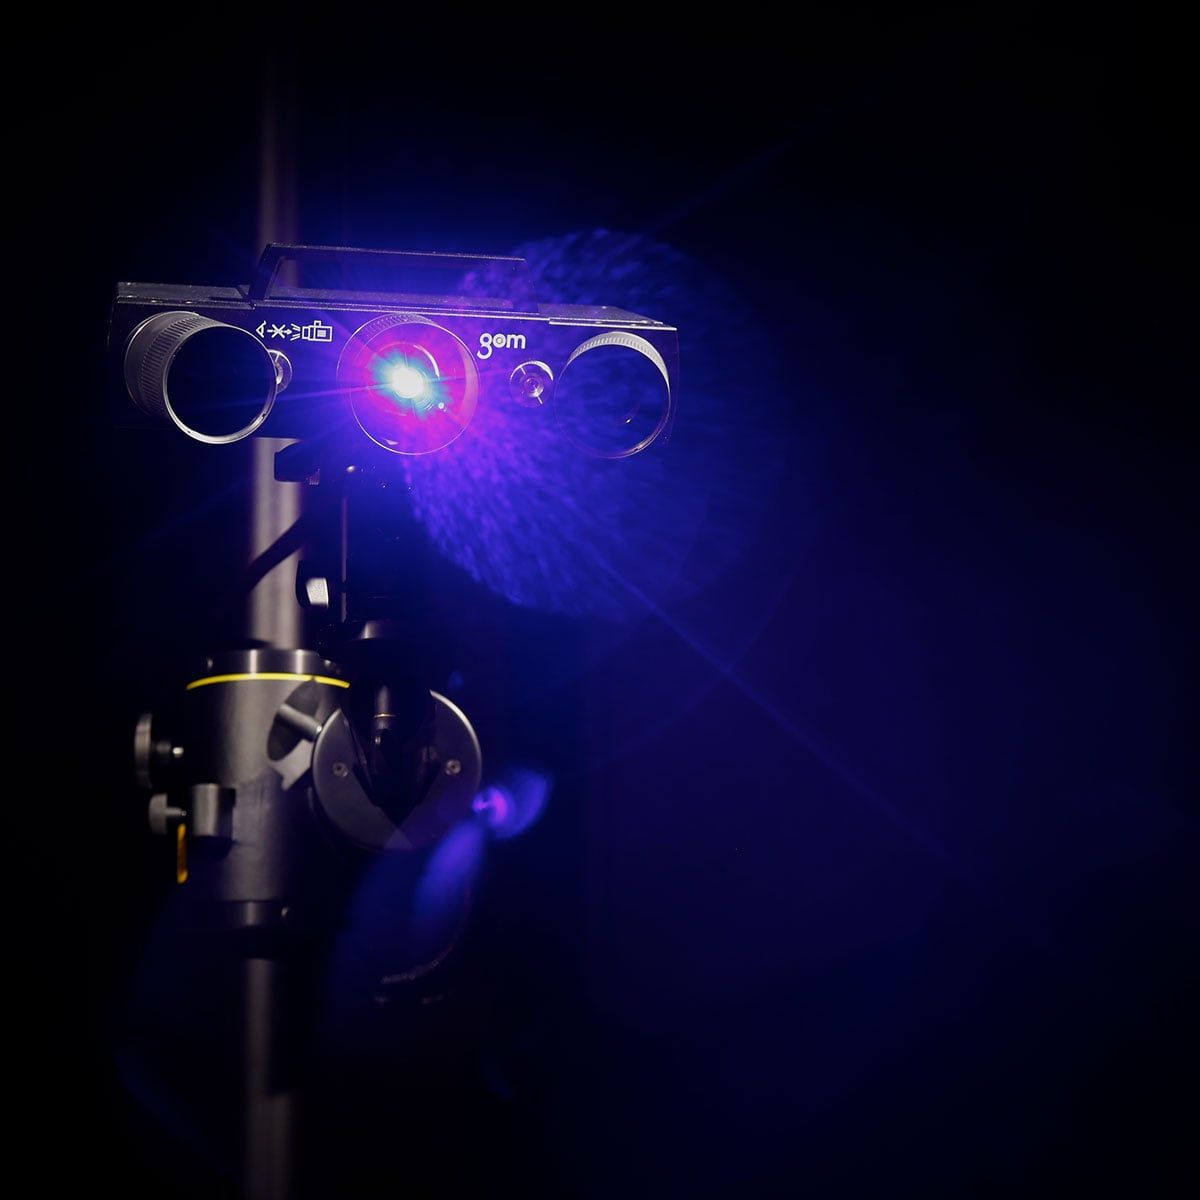 Blue light inspection, 3d scanning